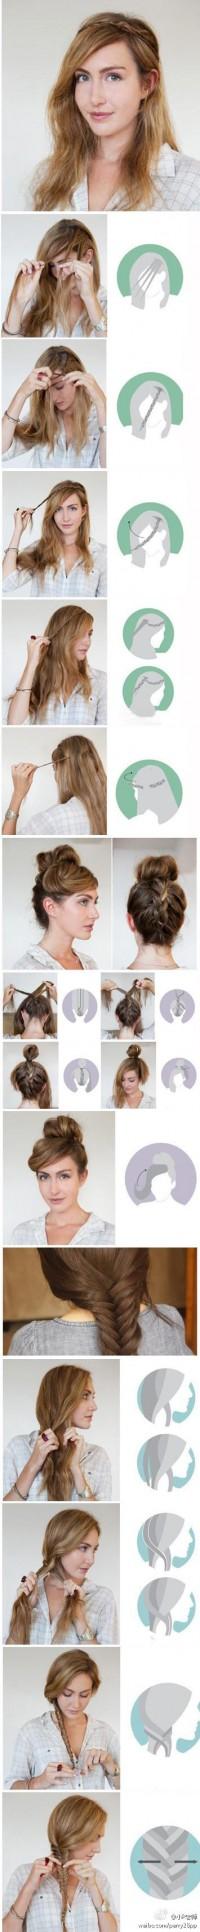 DIY Braided Hair Hairstyles DIY Projects | UsefulDIY.com